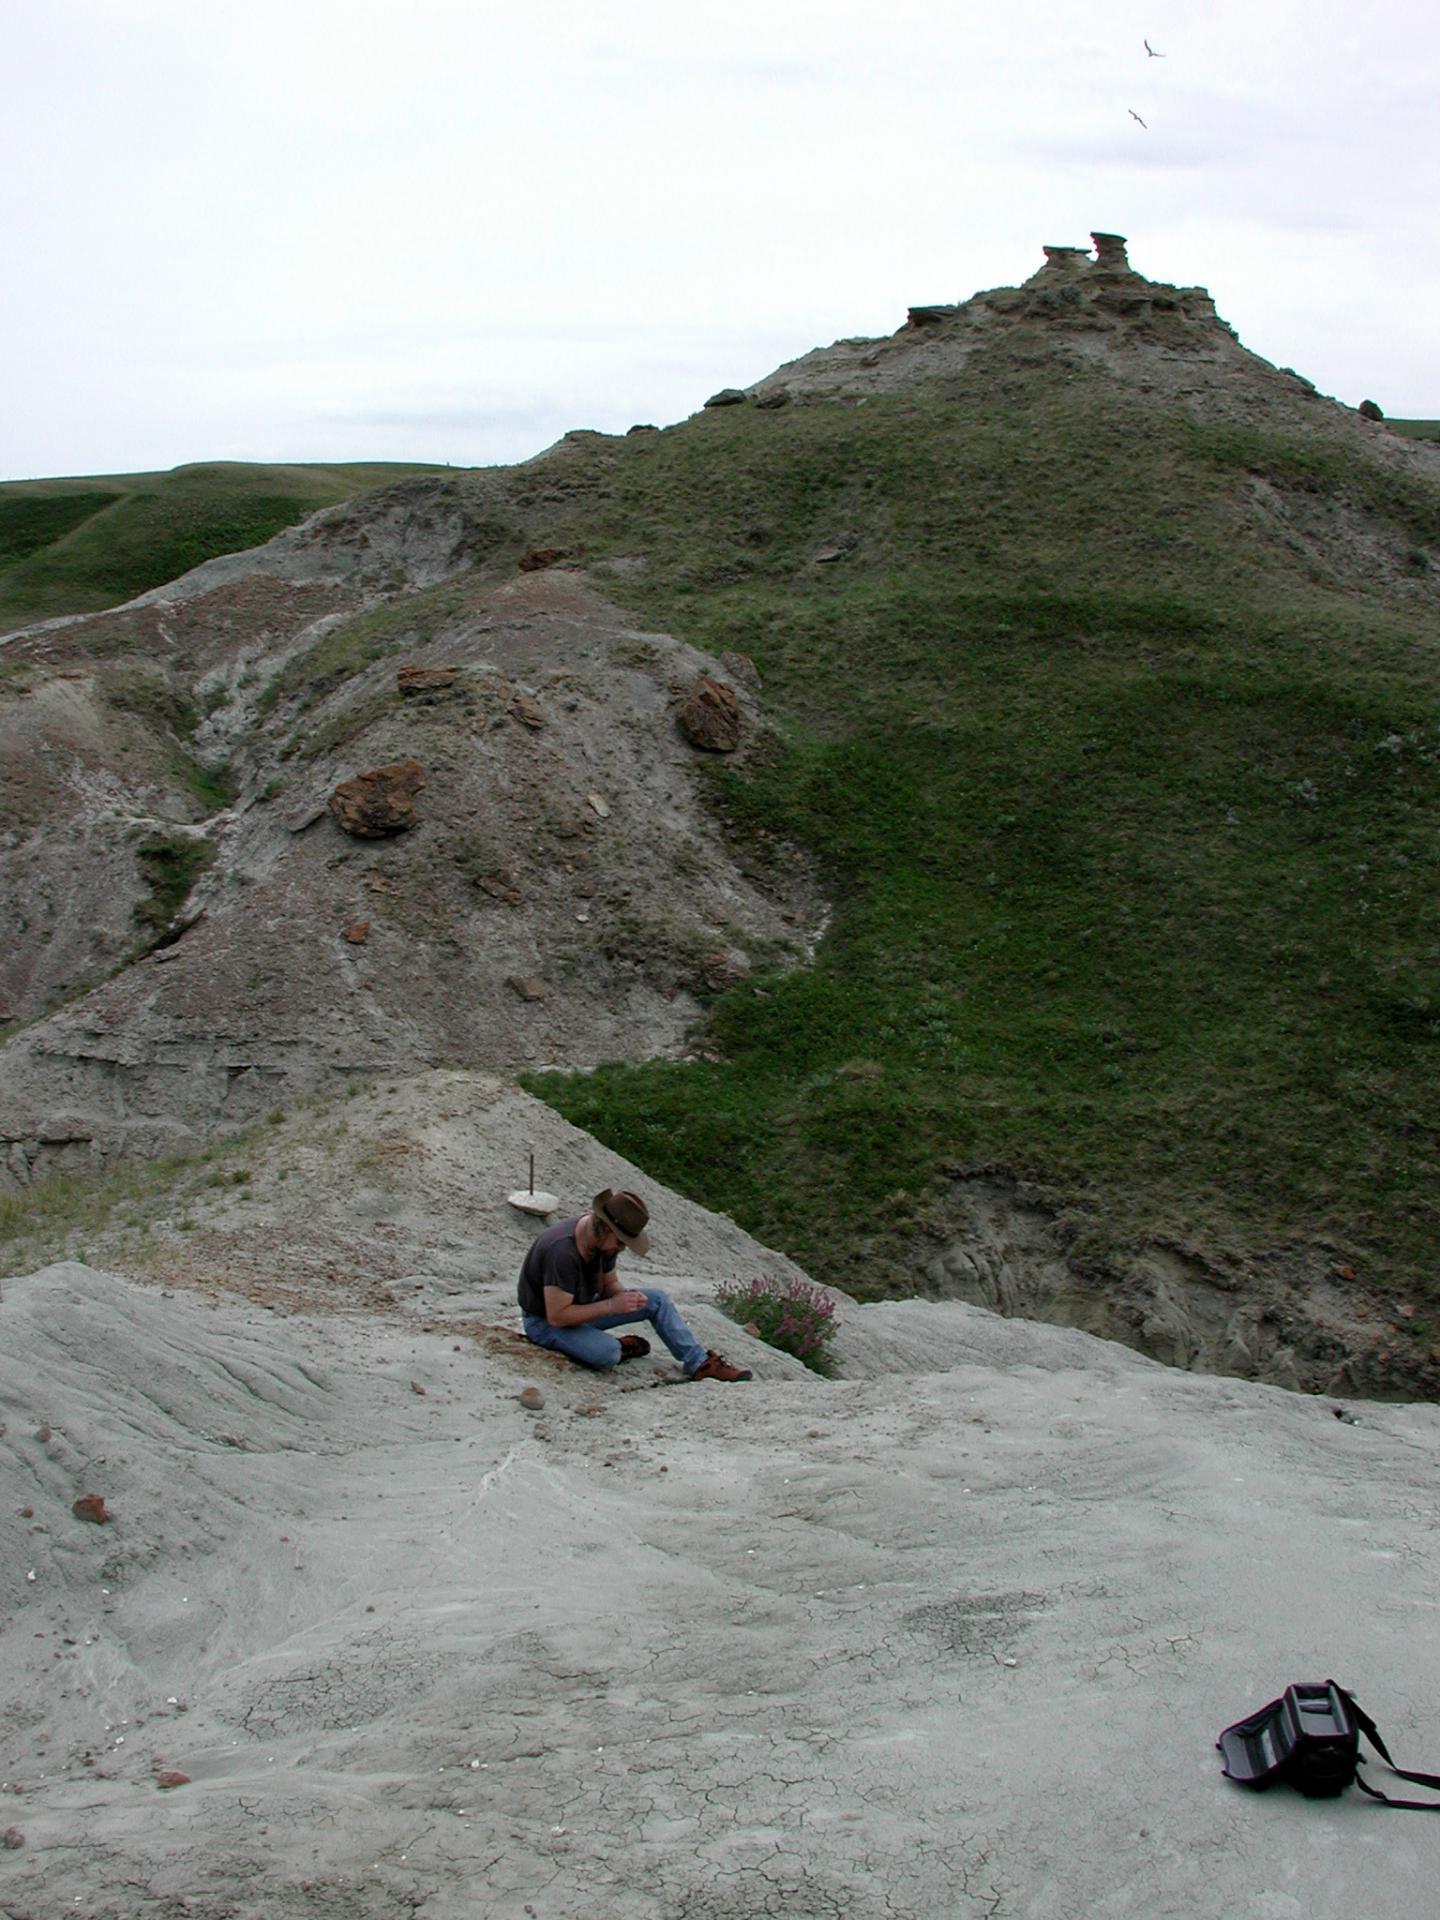 Dinosaur Nesting Site in Alberta, Canada